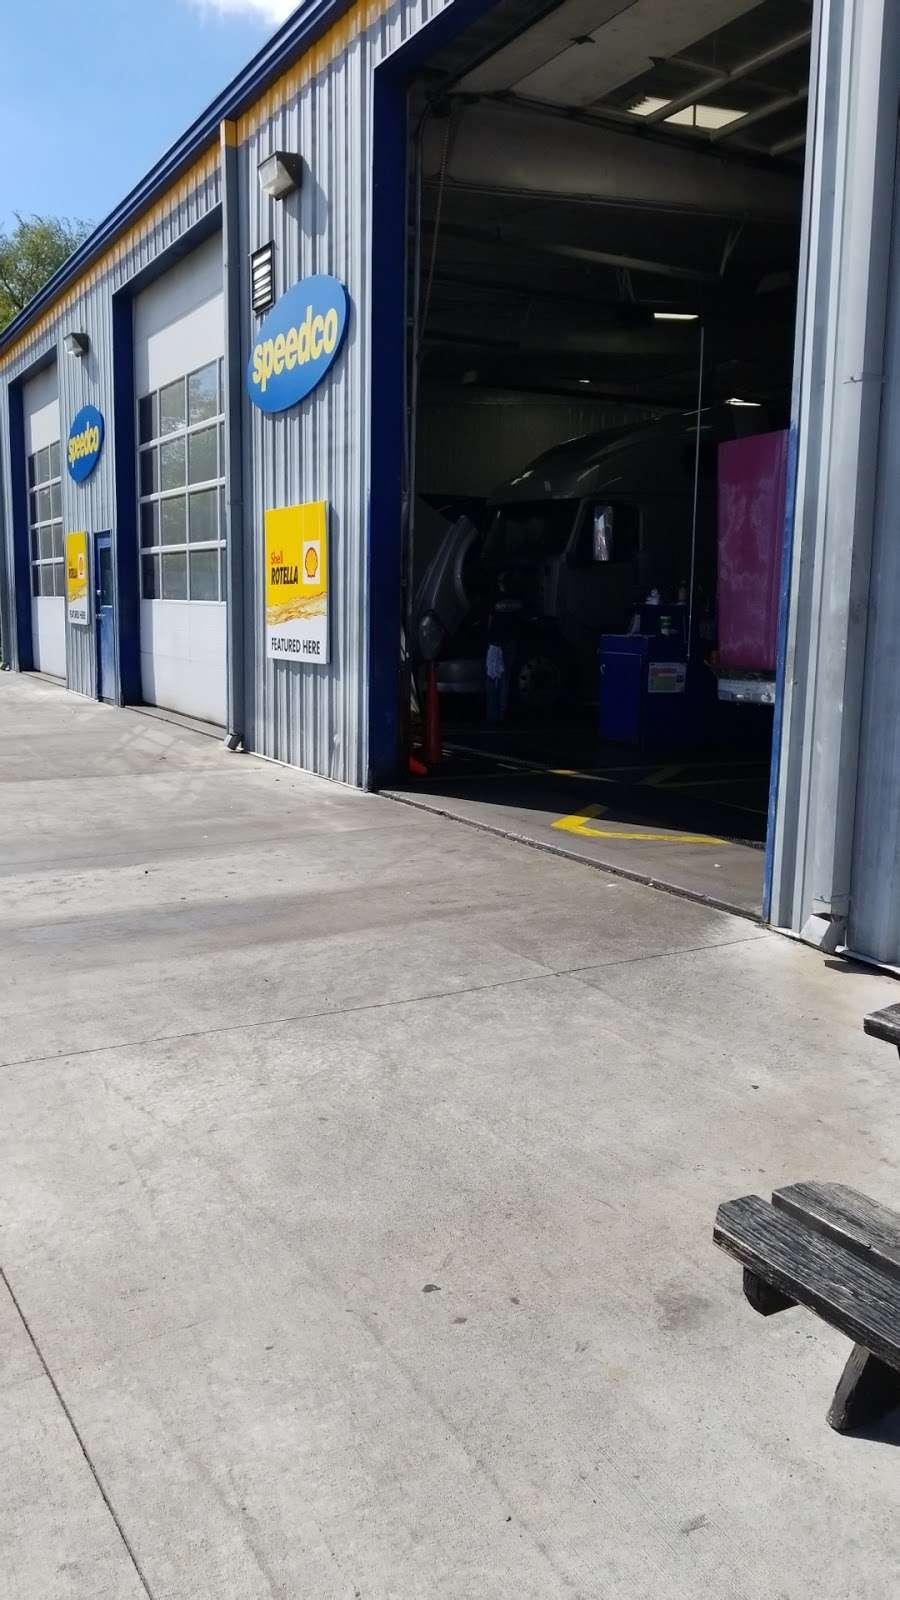 Speedco Truck Lube and Tires - car repair  | Photo 8 of 10 | Address: 301 SE 4th St, Oak Grove, MO 64075, USA | Phone: (816) 690-8717